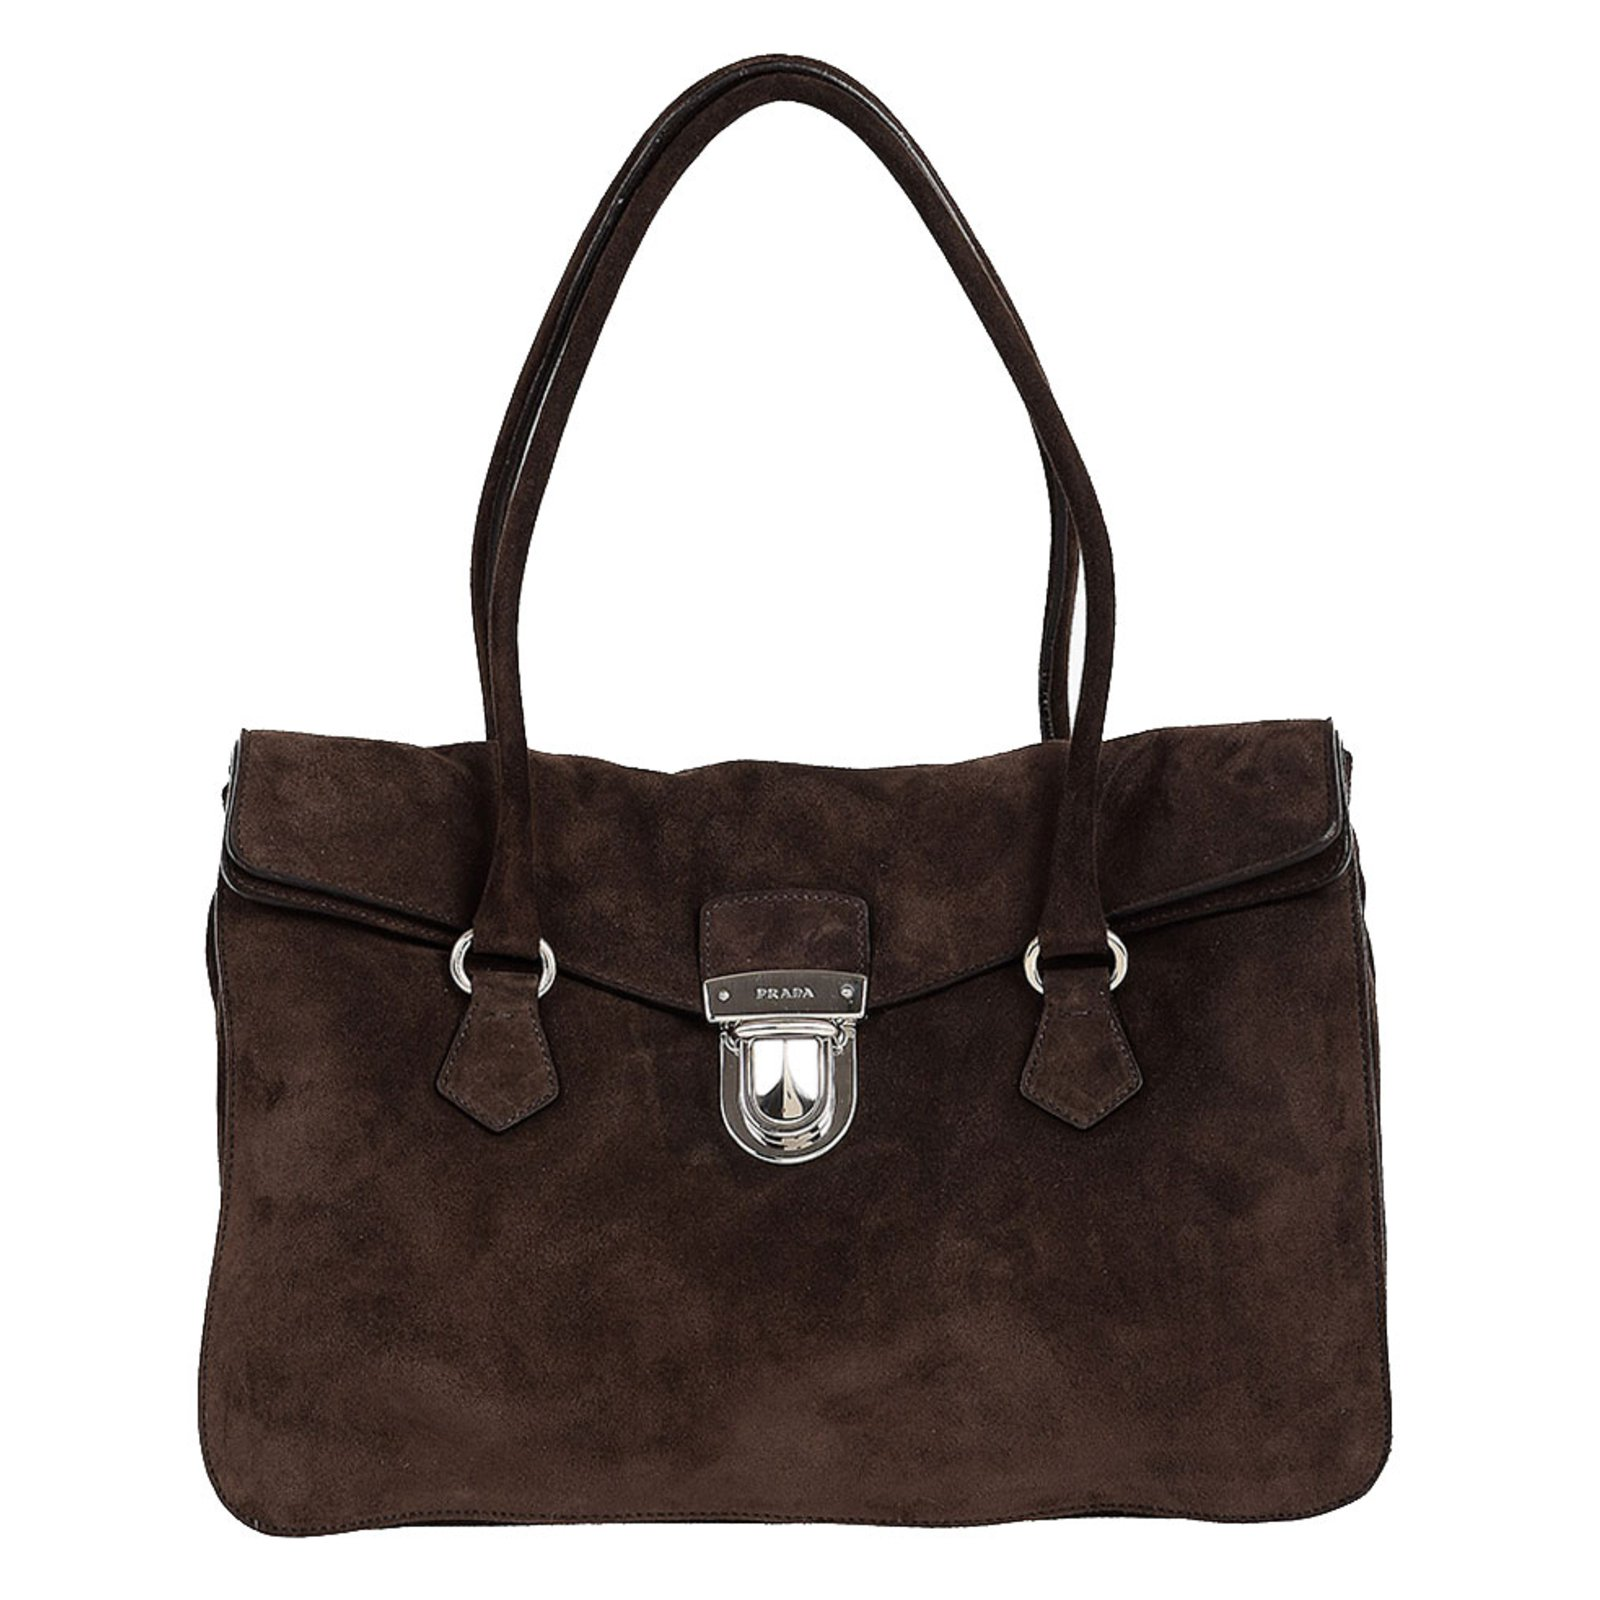 a0a4eee7dc6 ... italy prada prada suede leather bag handbags suede brown ref.65835  3bba7 1dde4